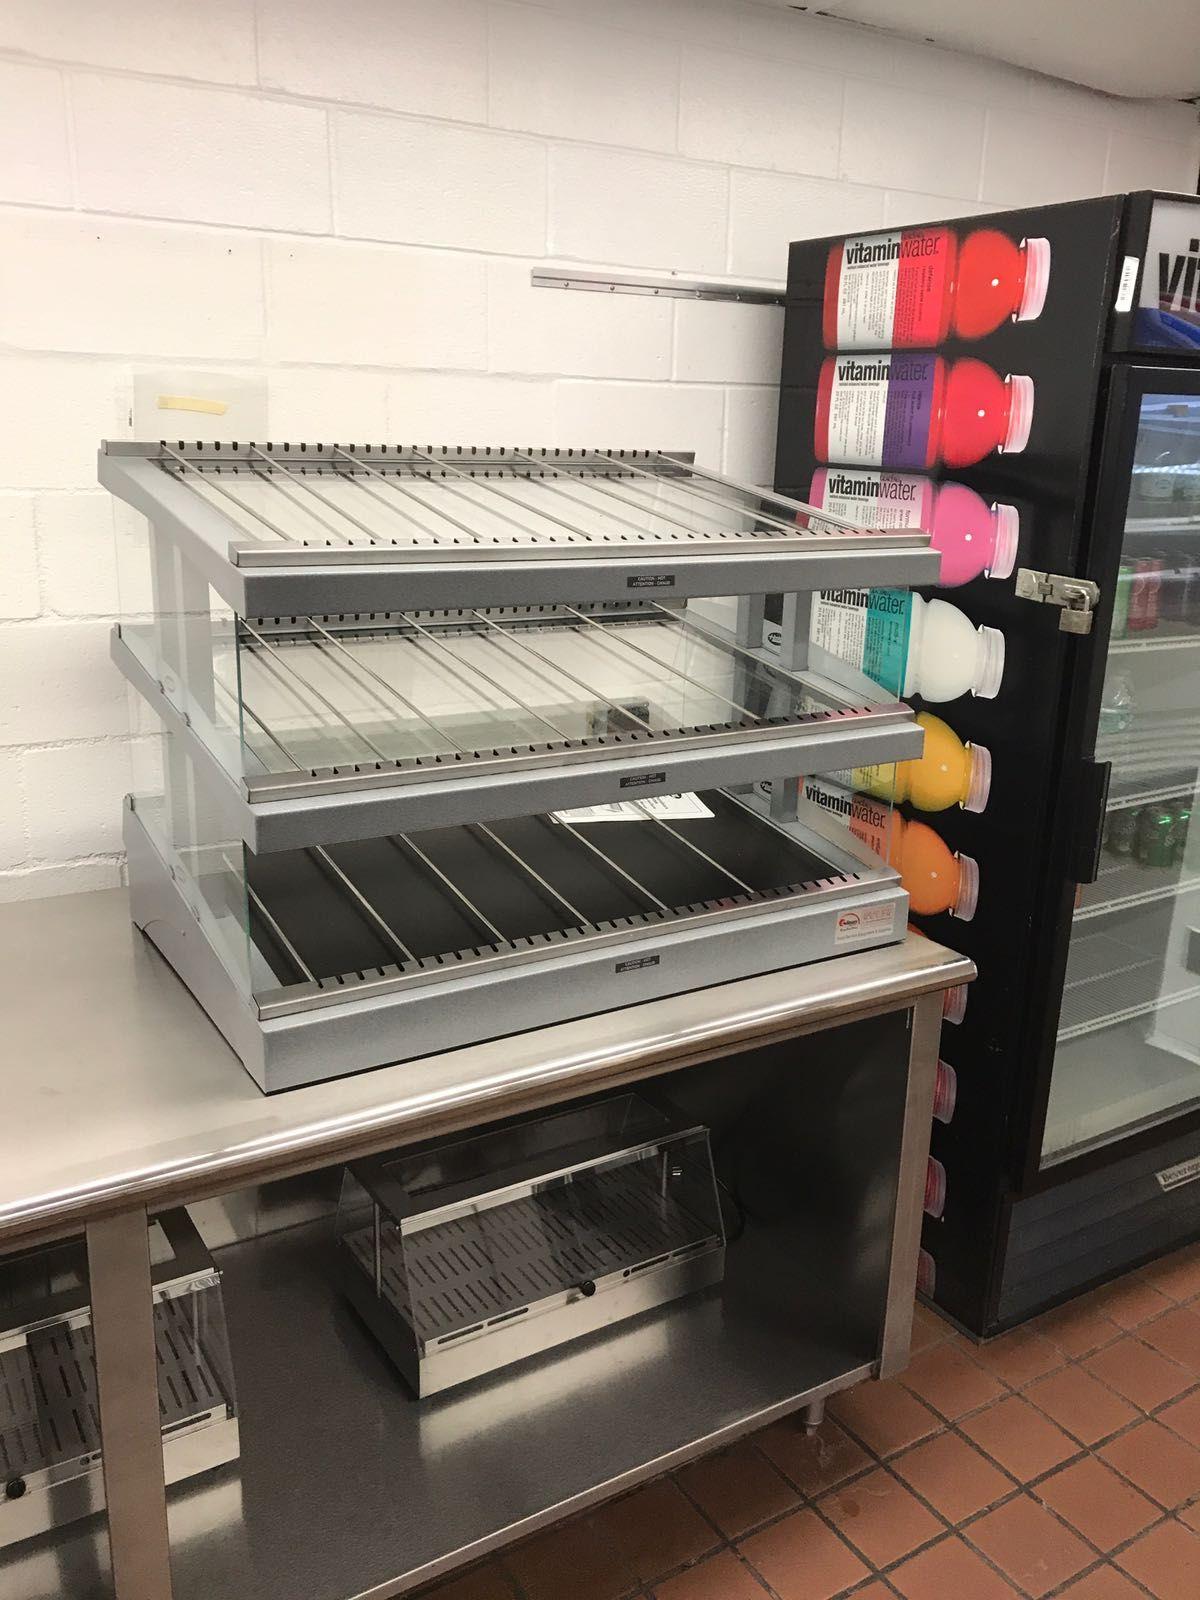 Pin by Culinary Depot on Restaurant Equipment wishlist